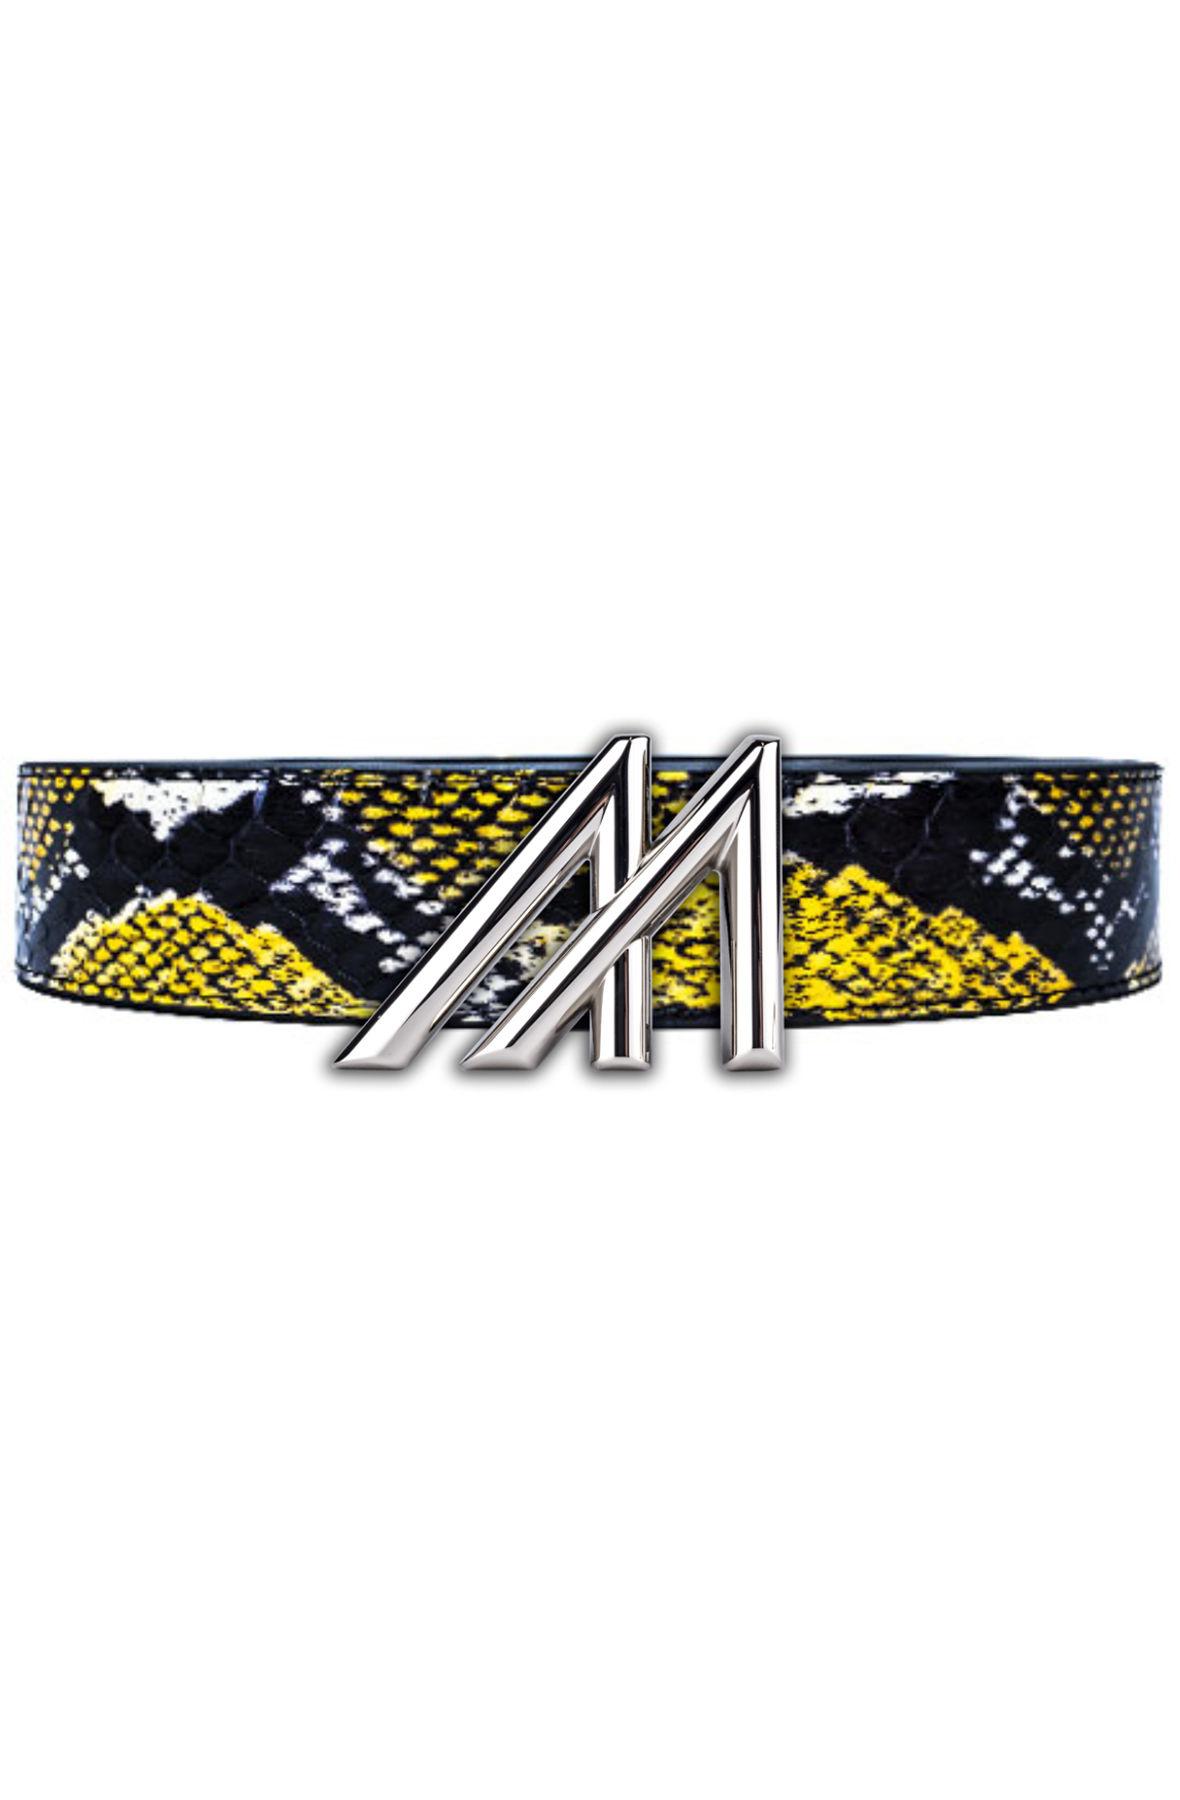 Image of Mint Yellow Tricolor 2 King Cobra Belt - Platinum M